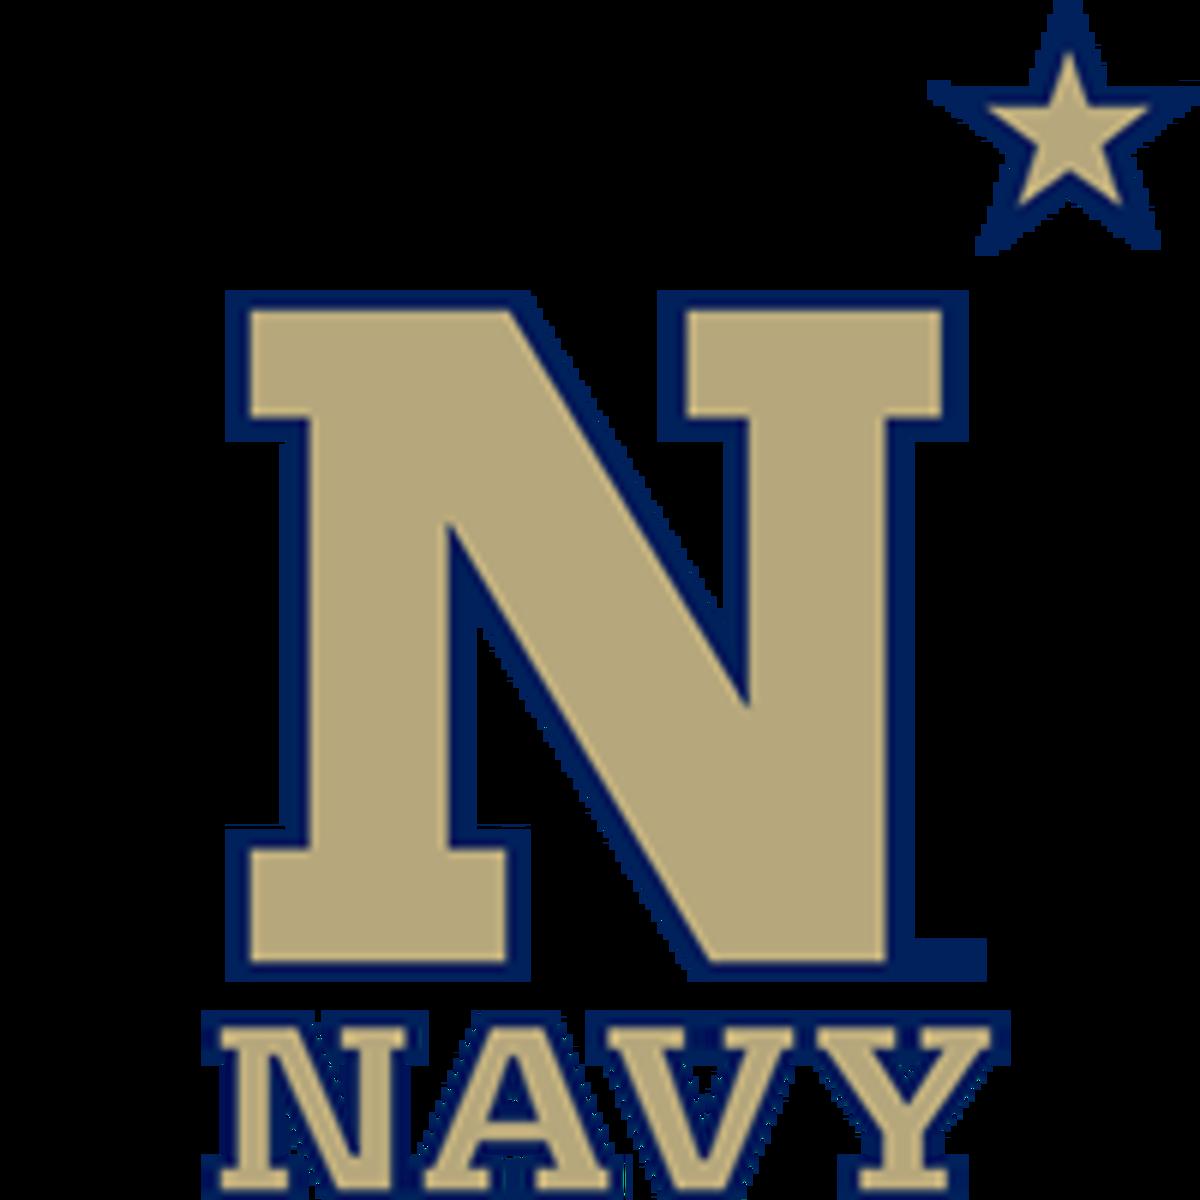 College football rankings: NAVY